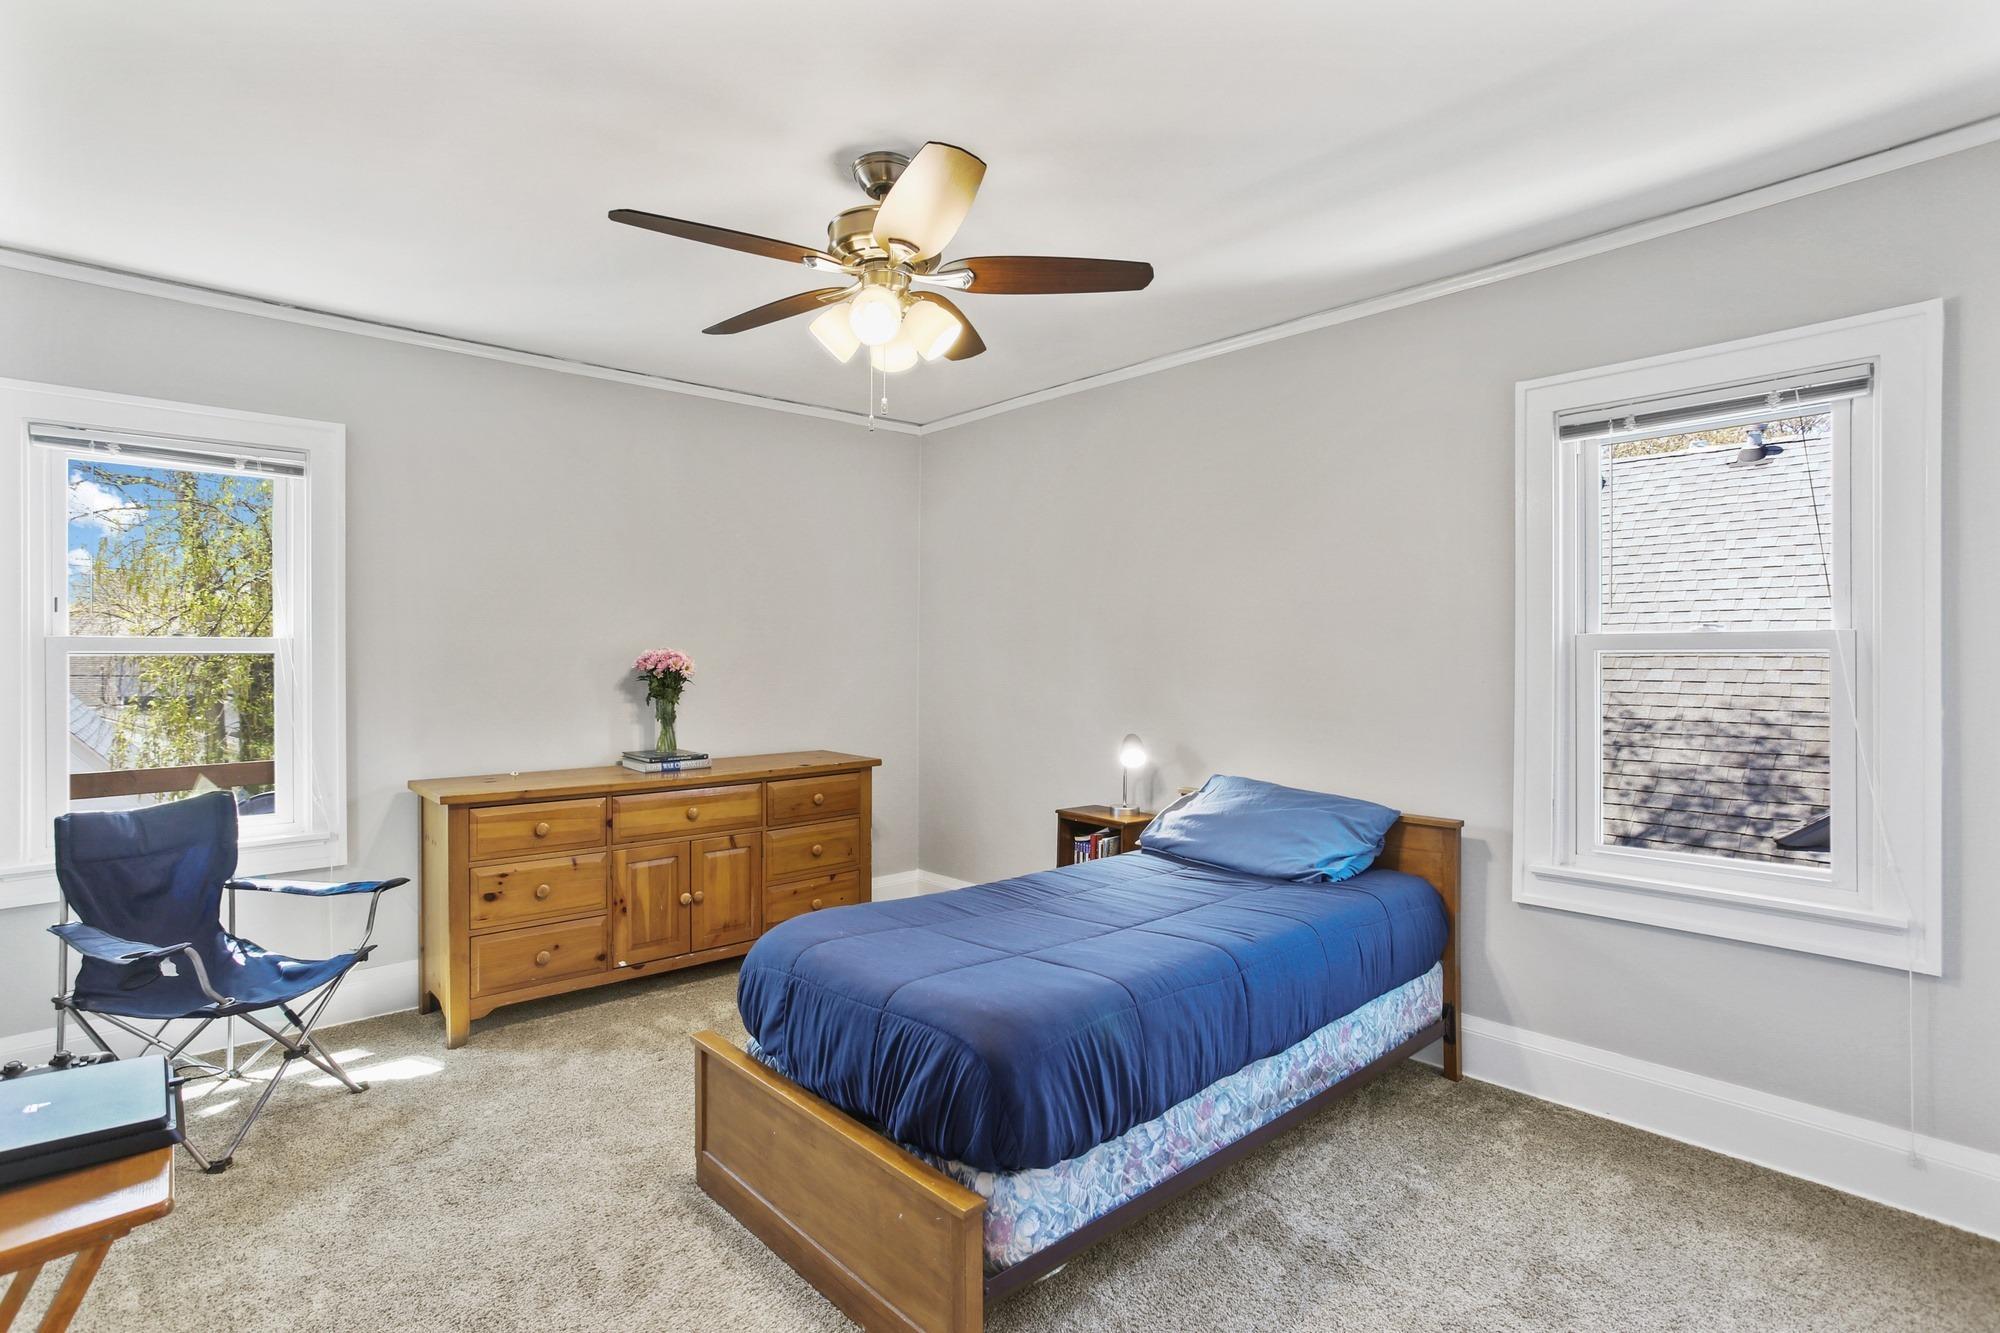 1907 Lake Bluff Blvd, Shorewood, Wisconsin 53211, 3 Bedrooms Bedrooms, 7 Rooms Rooms,1 BathroomBathrooms,Single-Family,For Sale,Lake Bluff Blvd,1690374